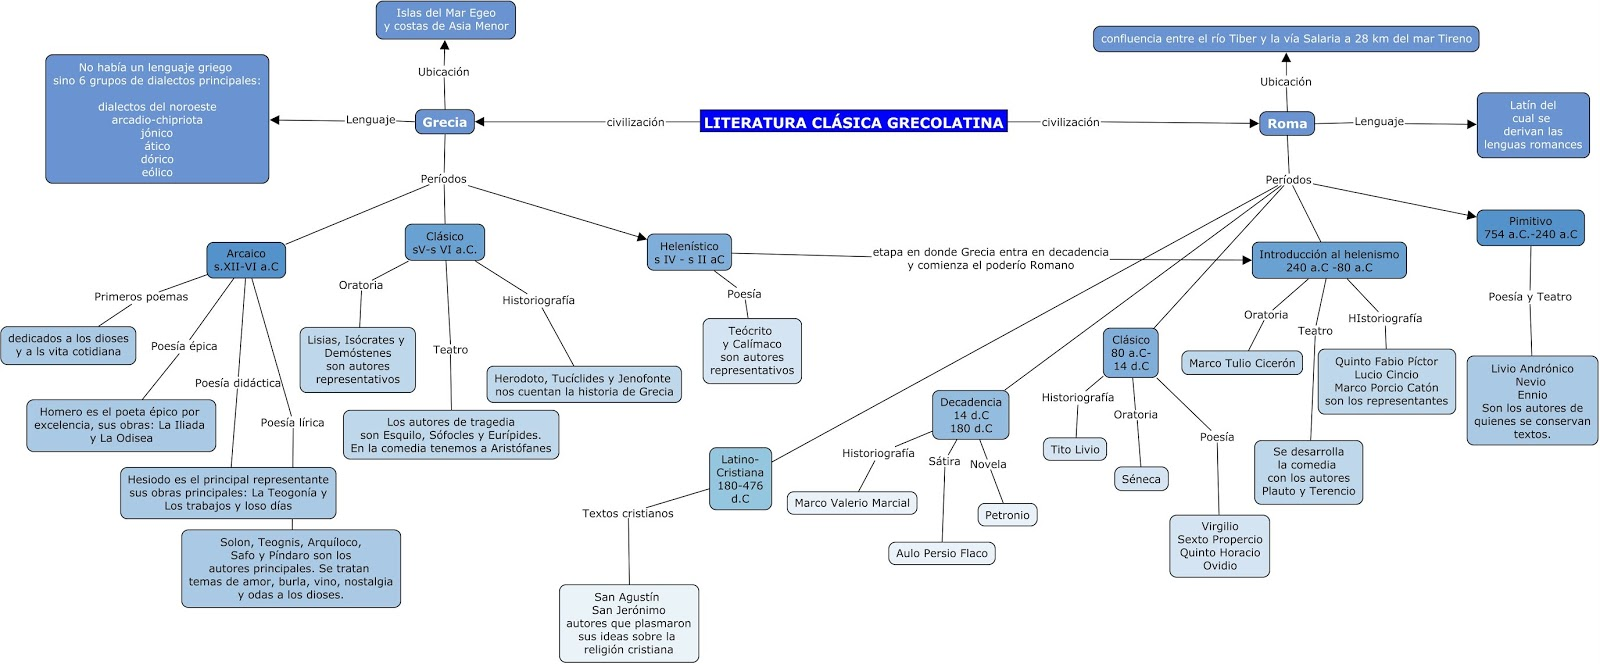 mapa conceptual sobre la literatura clásica grecolatina